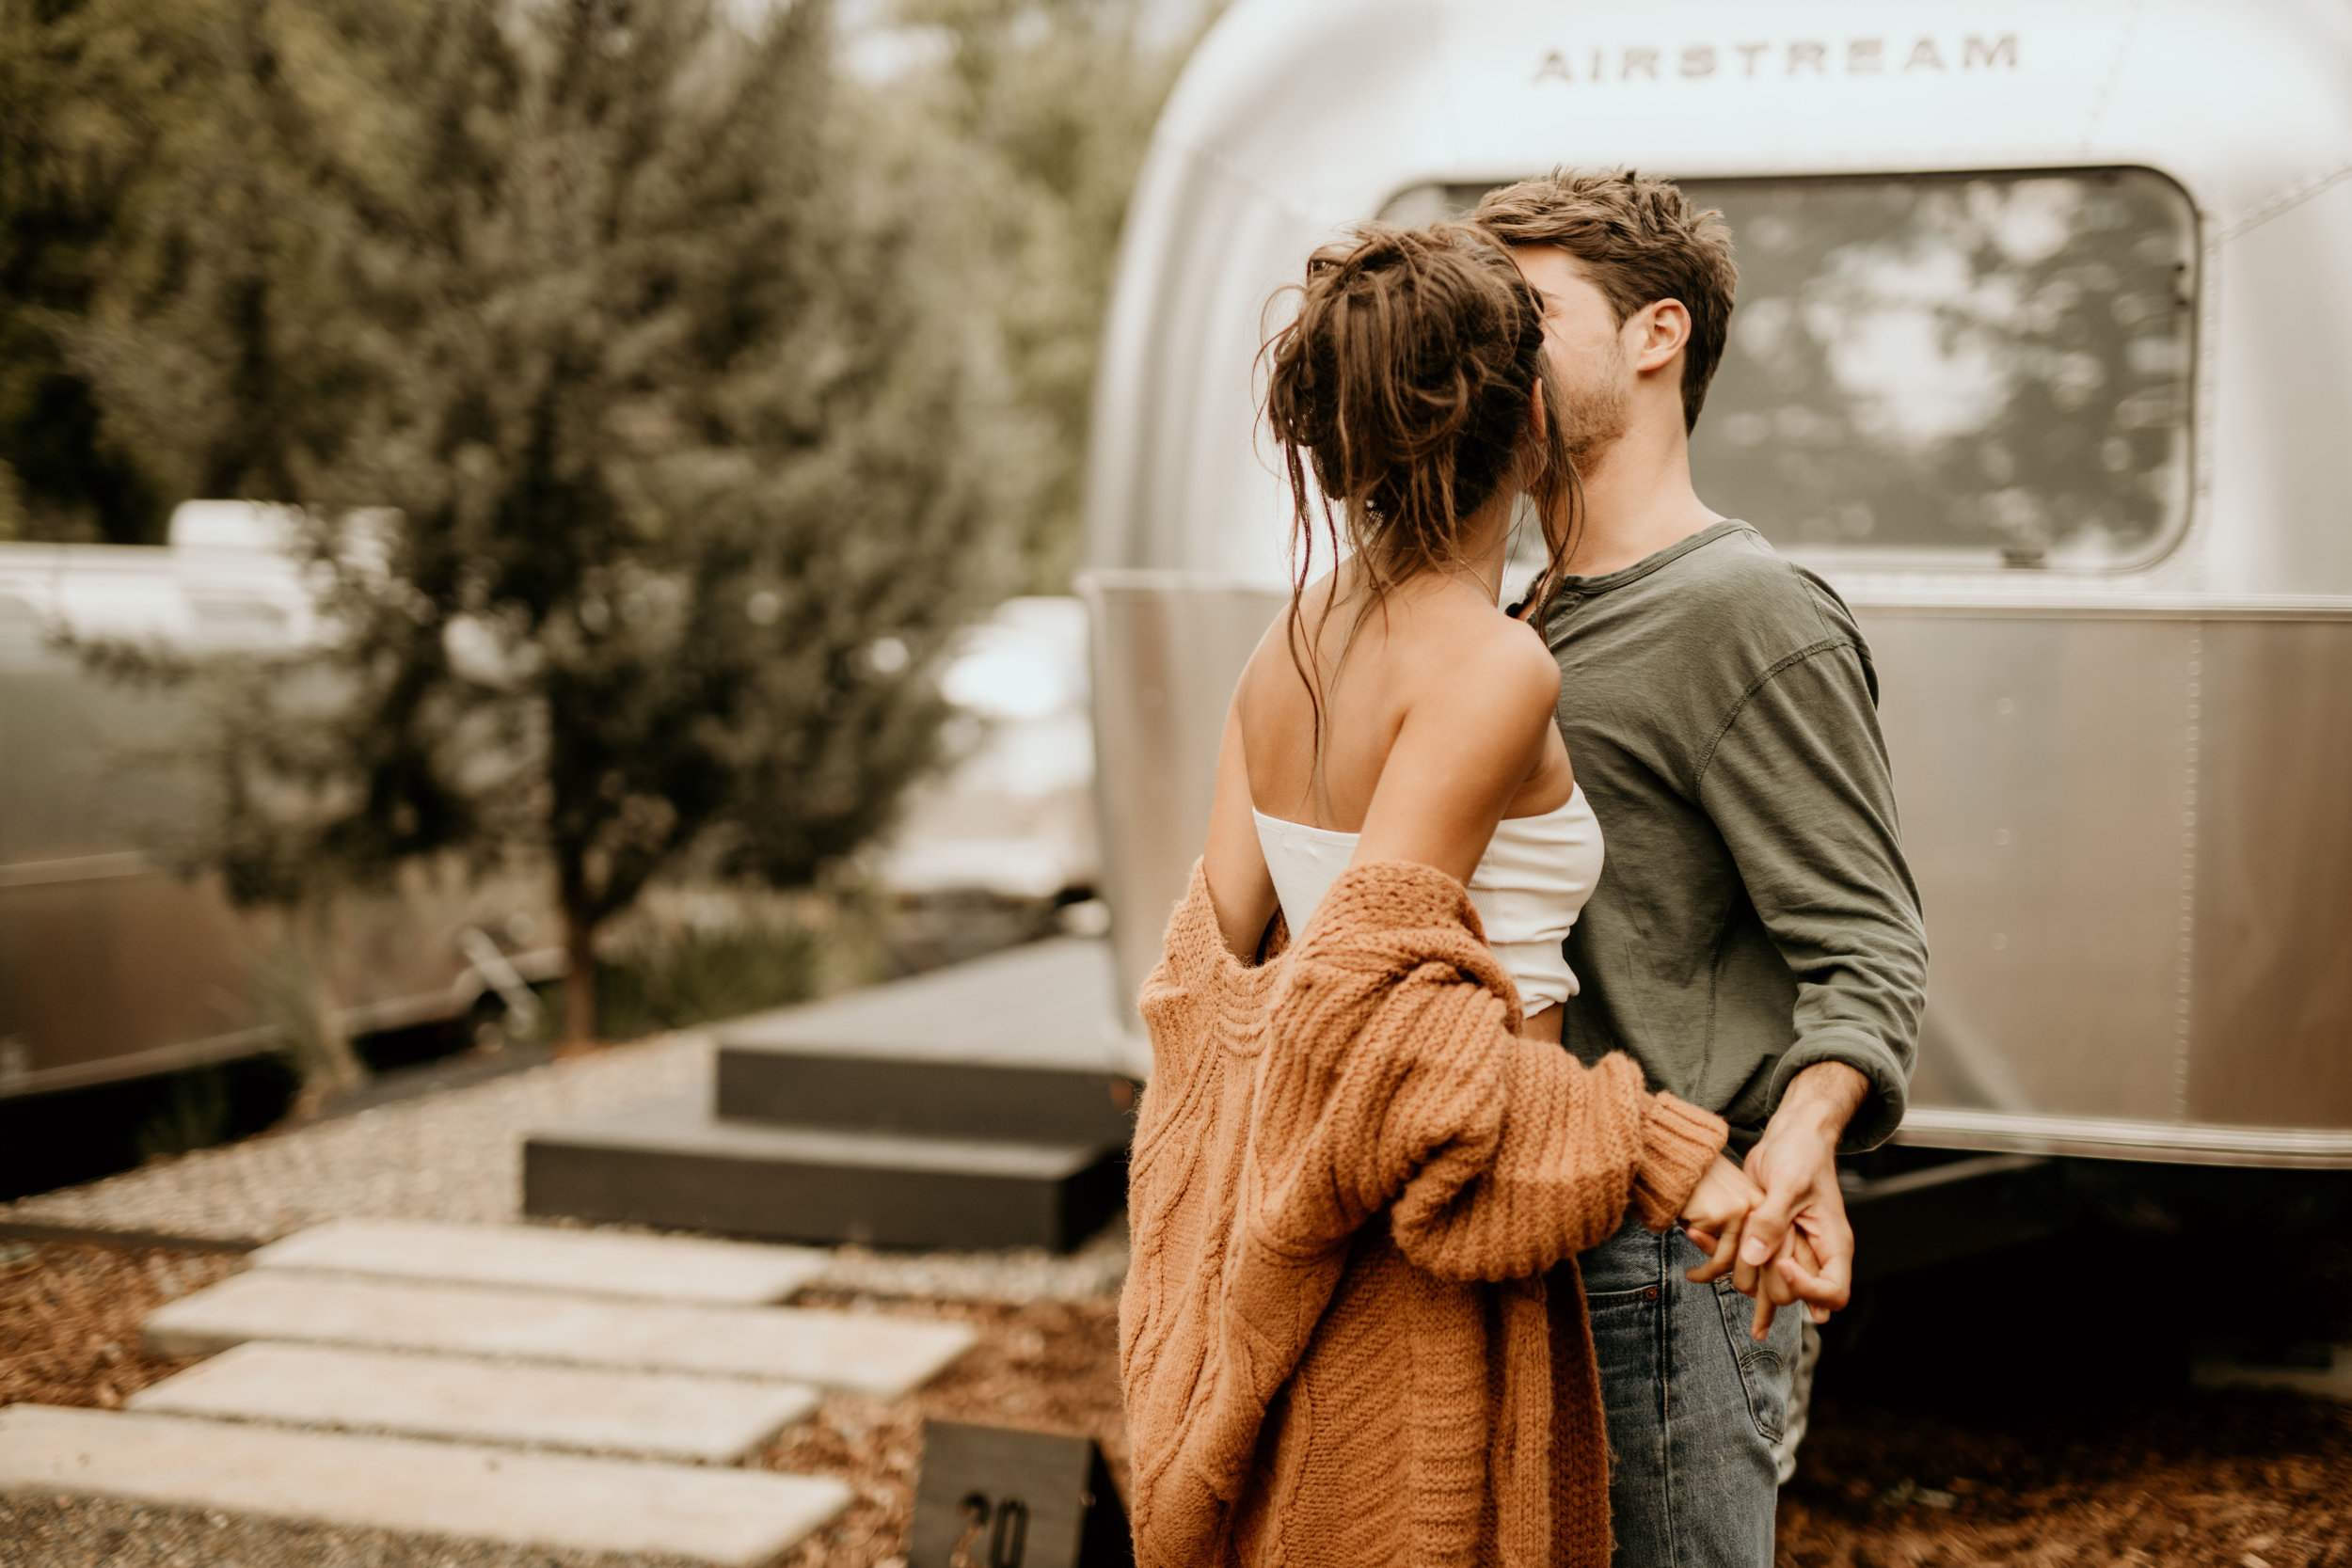 couples-engagement-outdoor-tatoo-photoshoot-little-rock-arkansas-6702.jpg